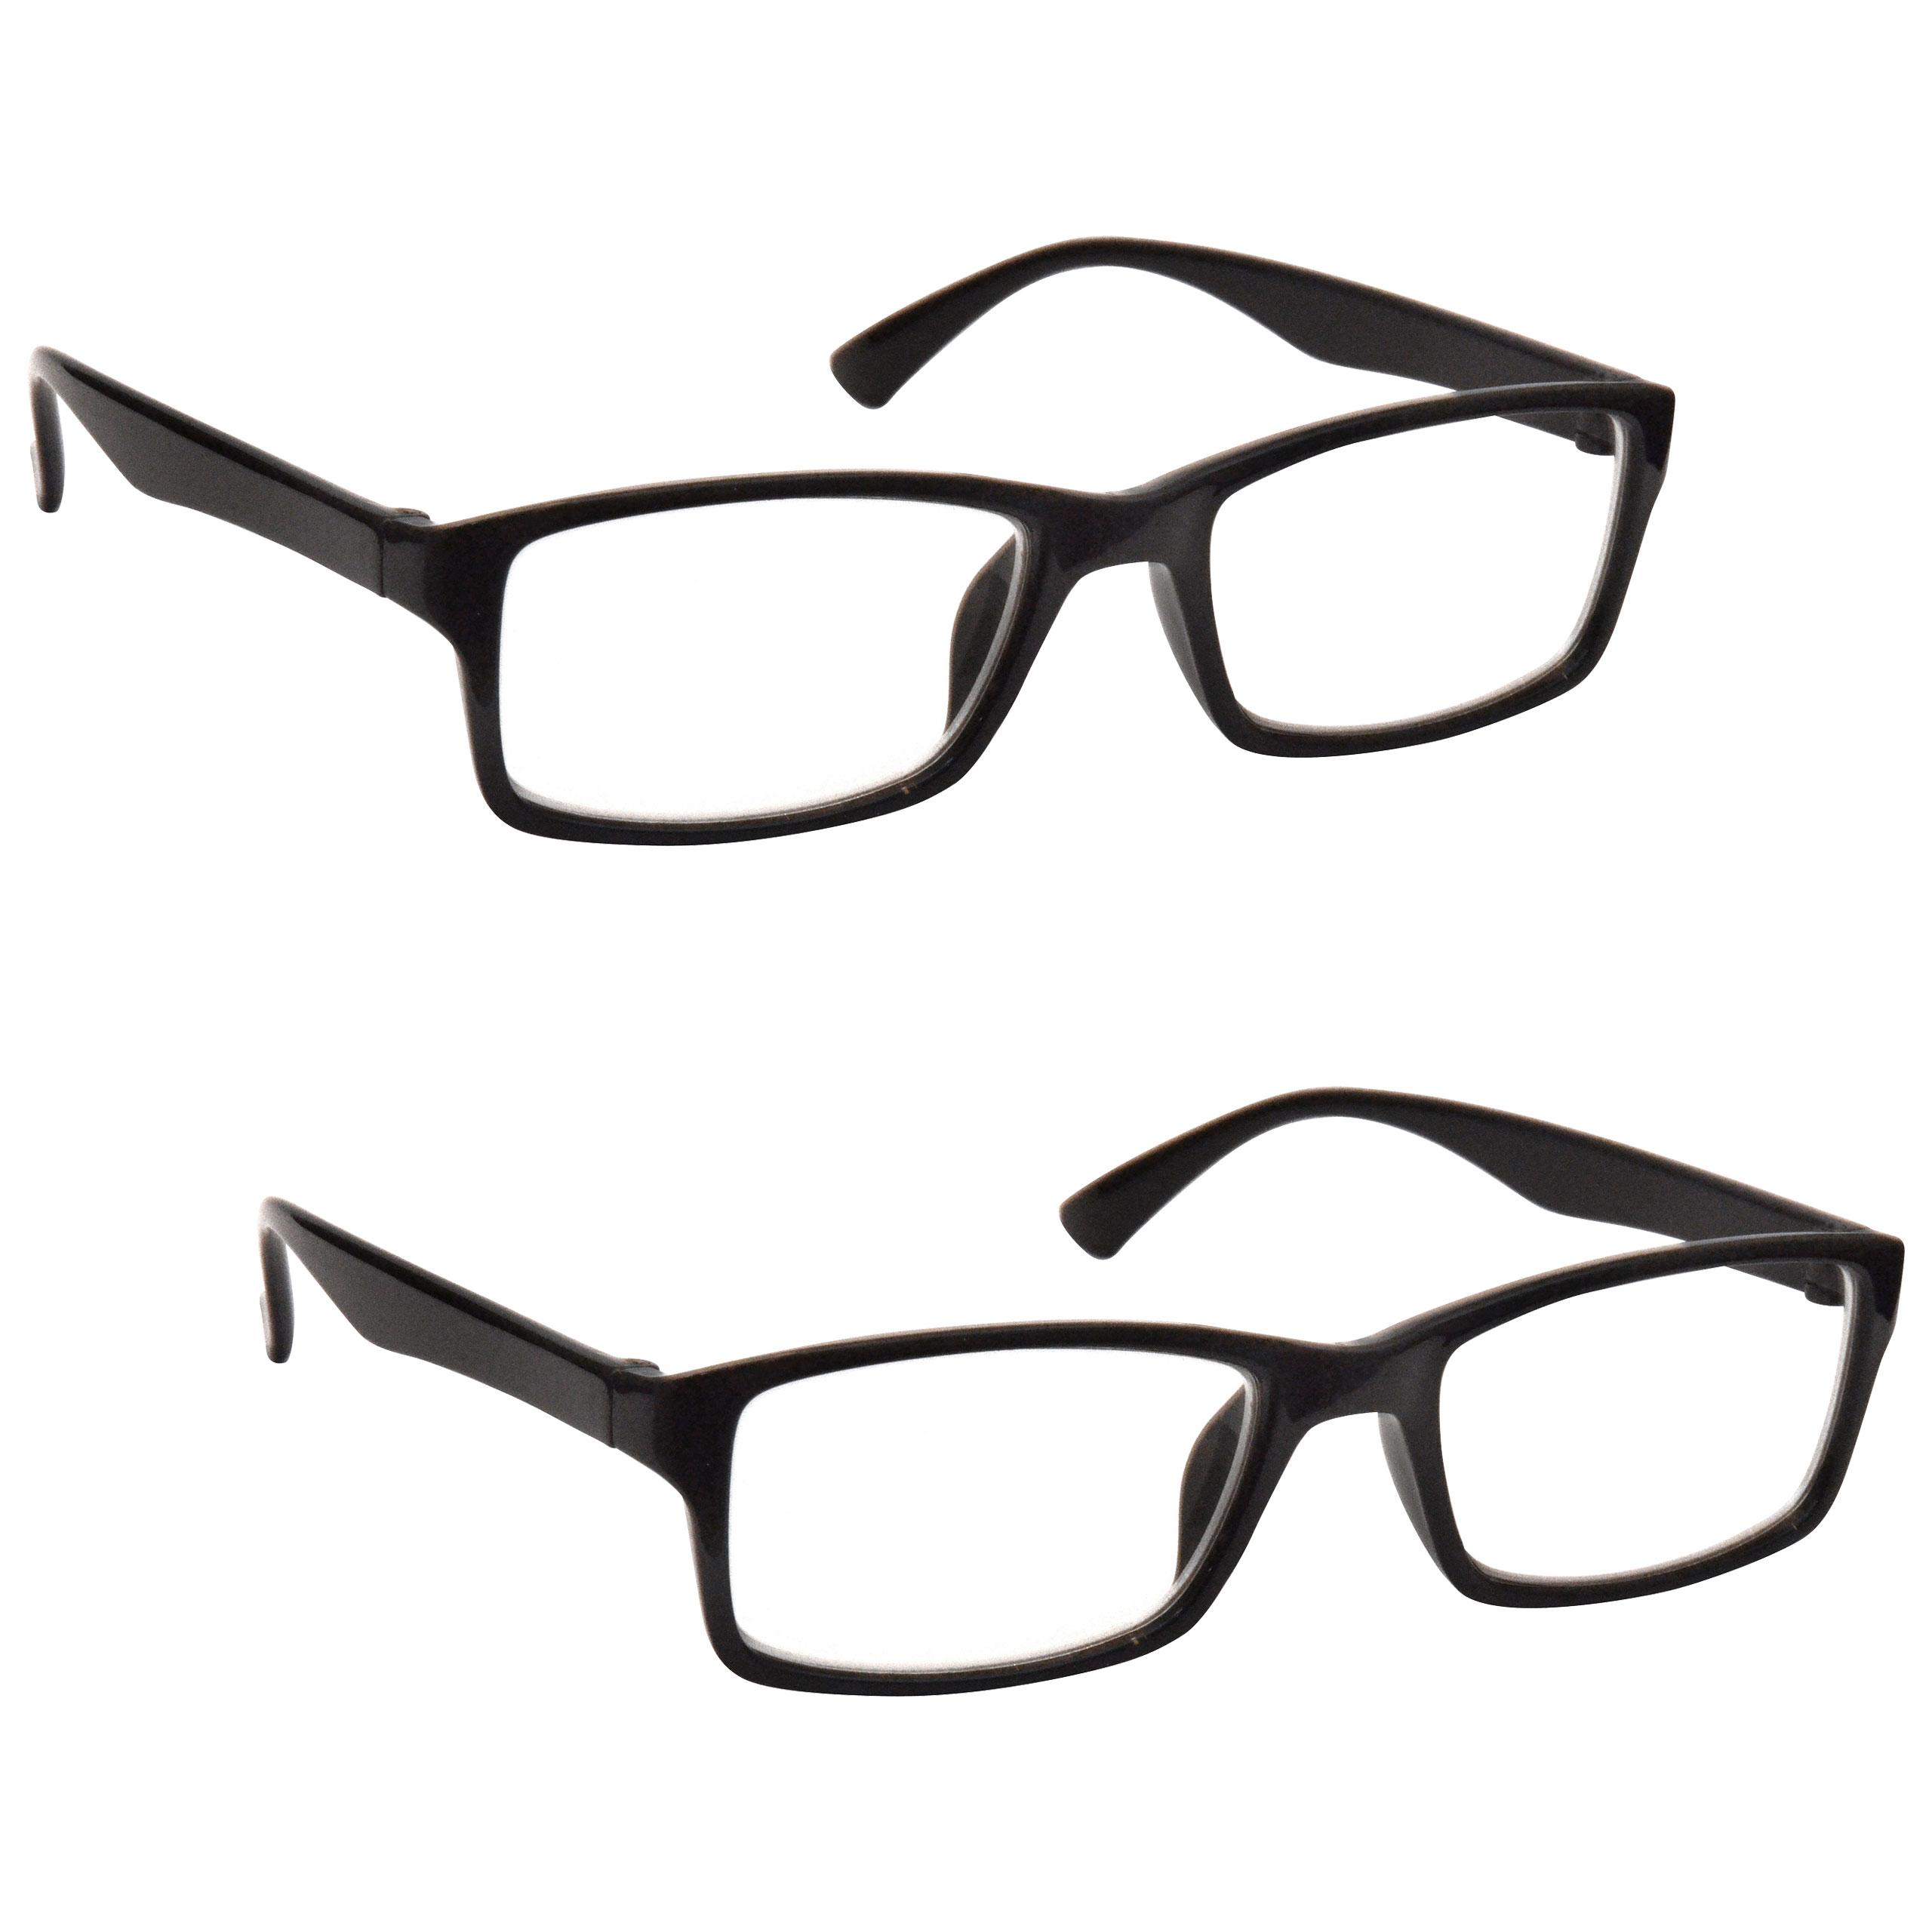 Distance Glasses Online - Best Glasses Cnapracticetesting.Com 2018